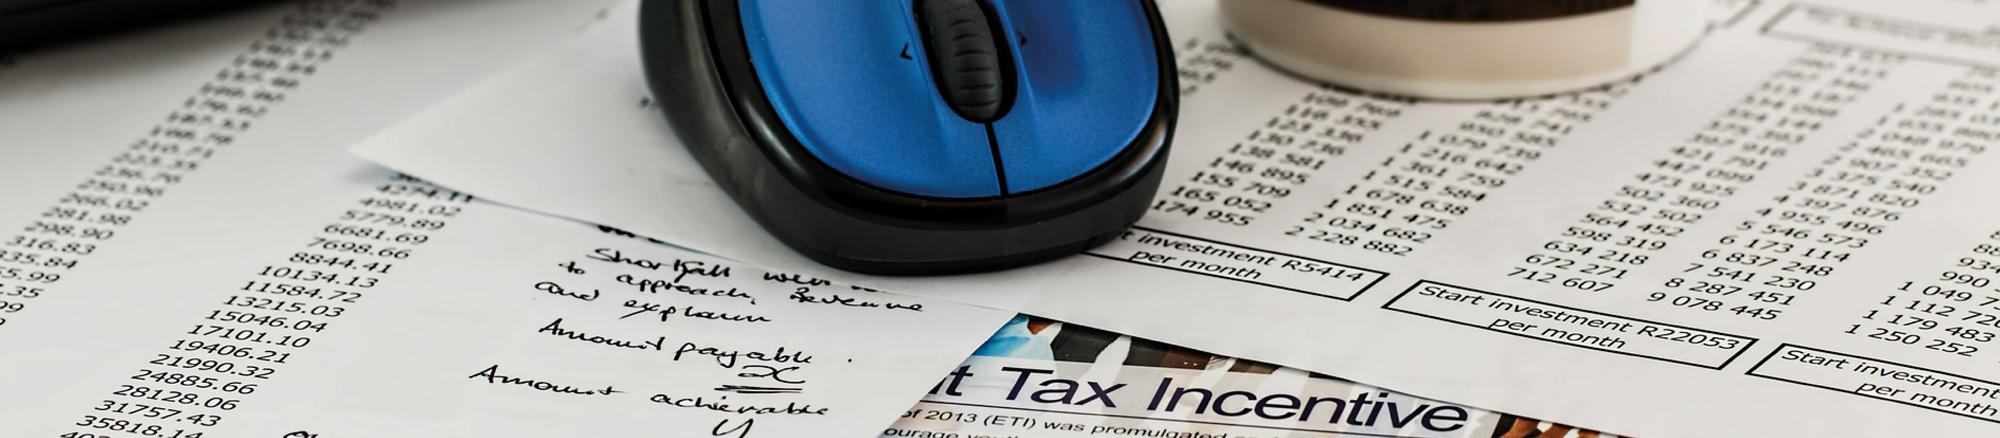 Taxe d'apprentissage 2020 : Nouvelles modalités de versement ! - Interfor Formation Alternance